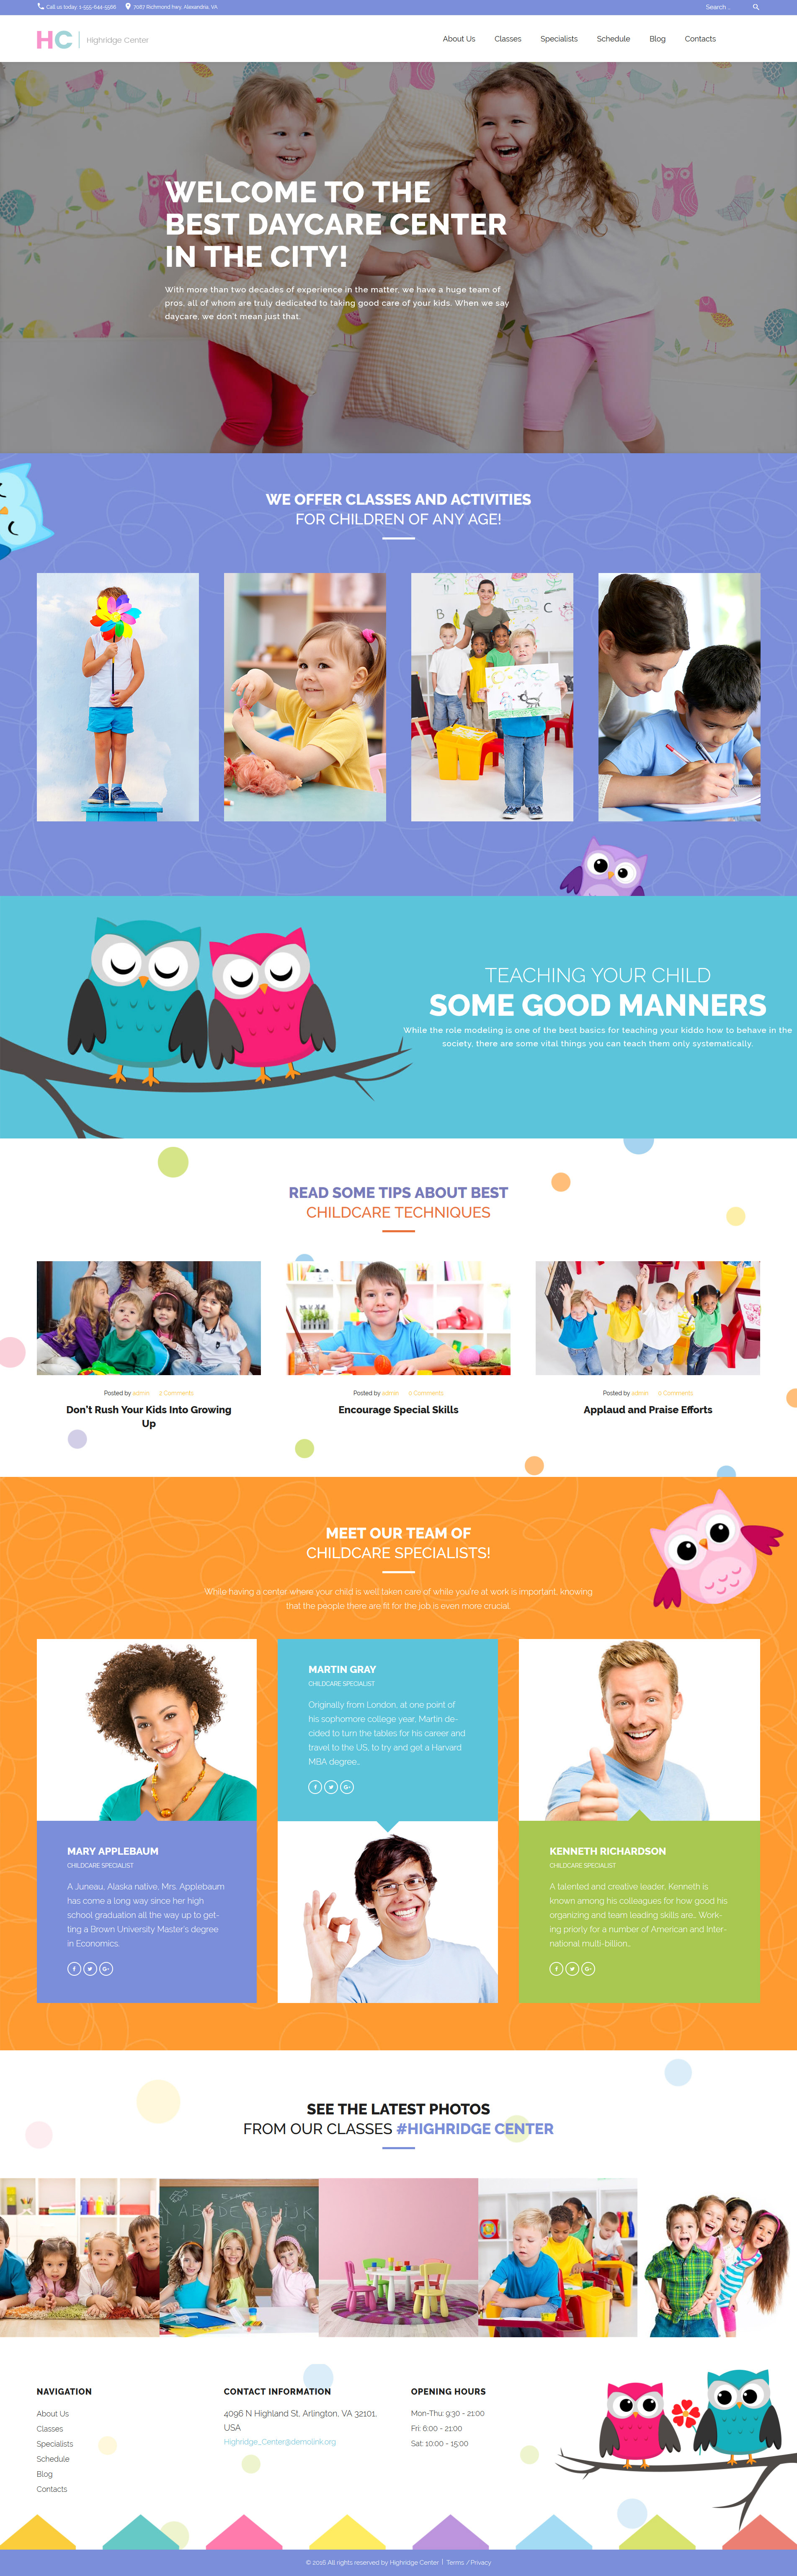 Responsivt Highridge Center - Kindergarten & Child Care WordPress Theme WordPress-tema #62115